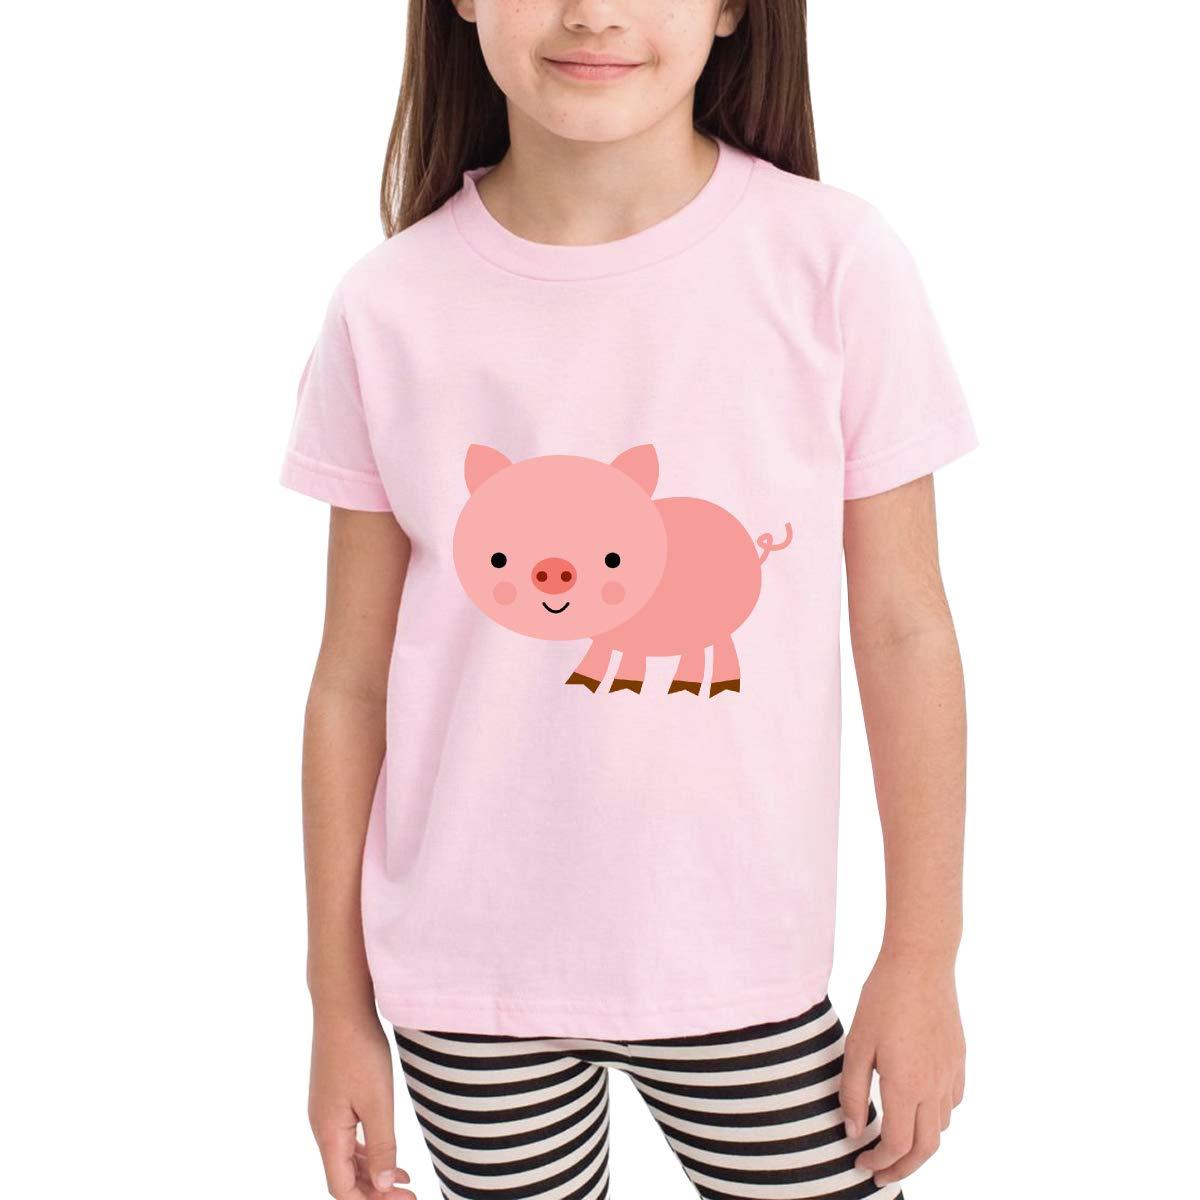 Cute Pink Pig 100/% Cotton Toddler Baby Boys Girls Kids Short Sleeve T Shirt Top Tee Clothes 2-6 T